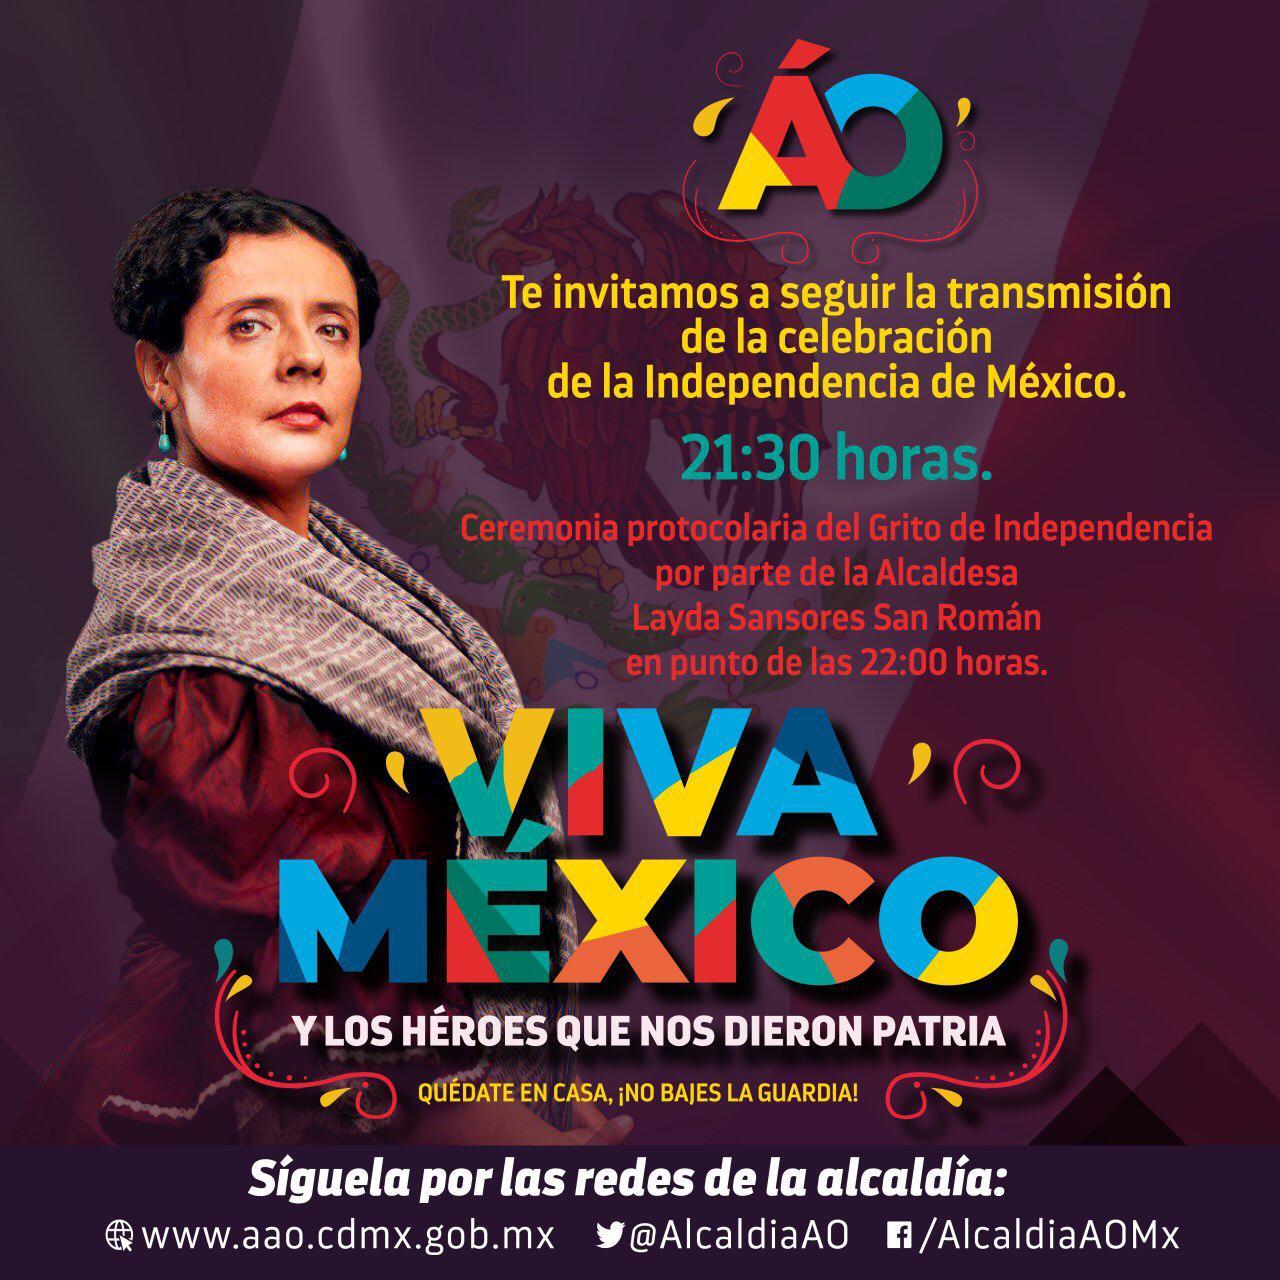 Layda Sansores alcaldesa en Álvaro Obregón dará grito de Independencia de manera virtual